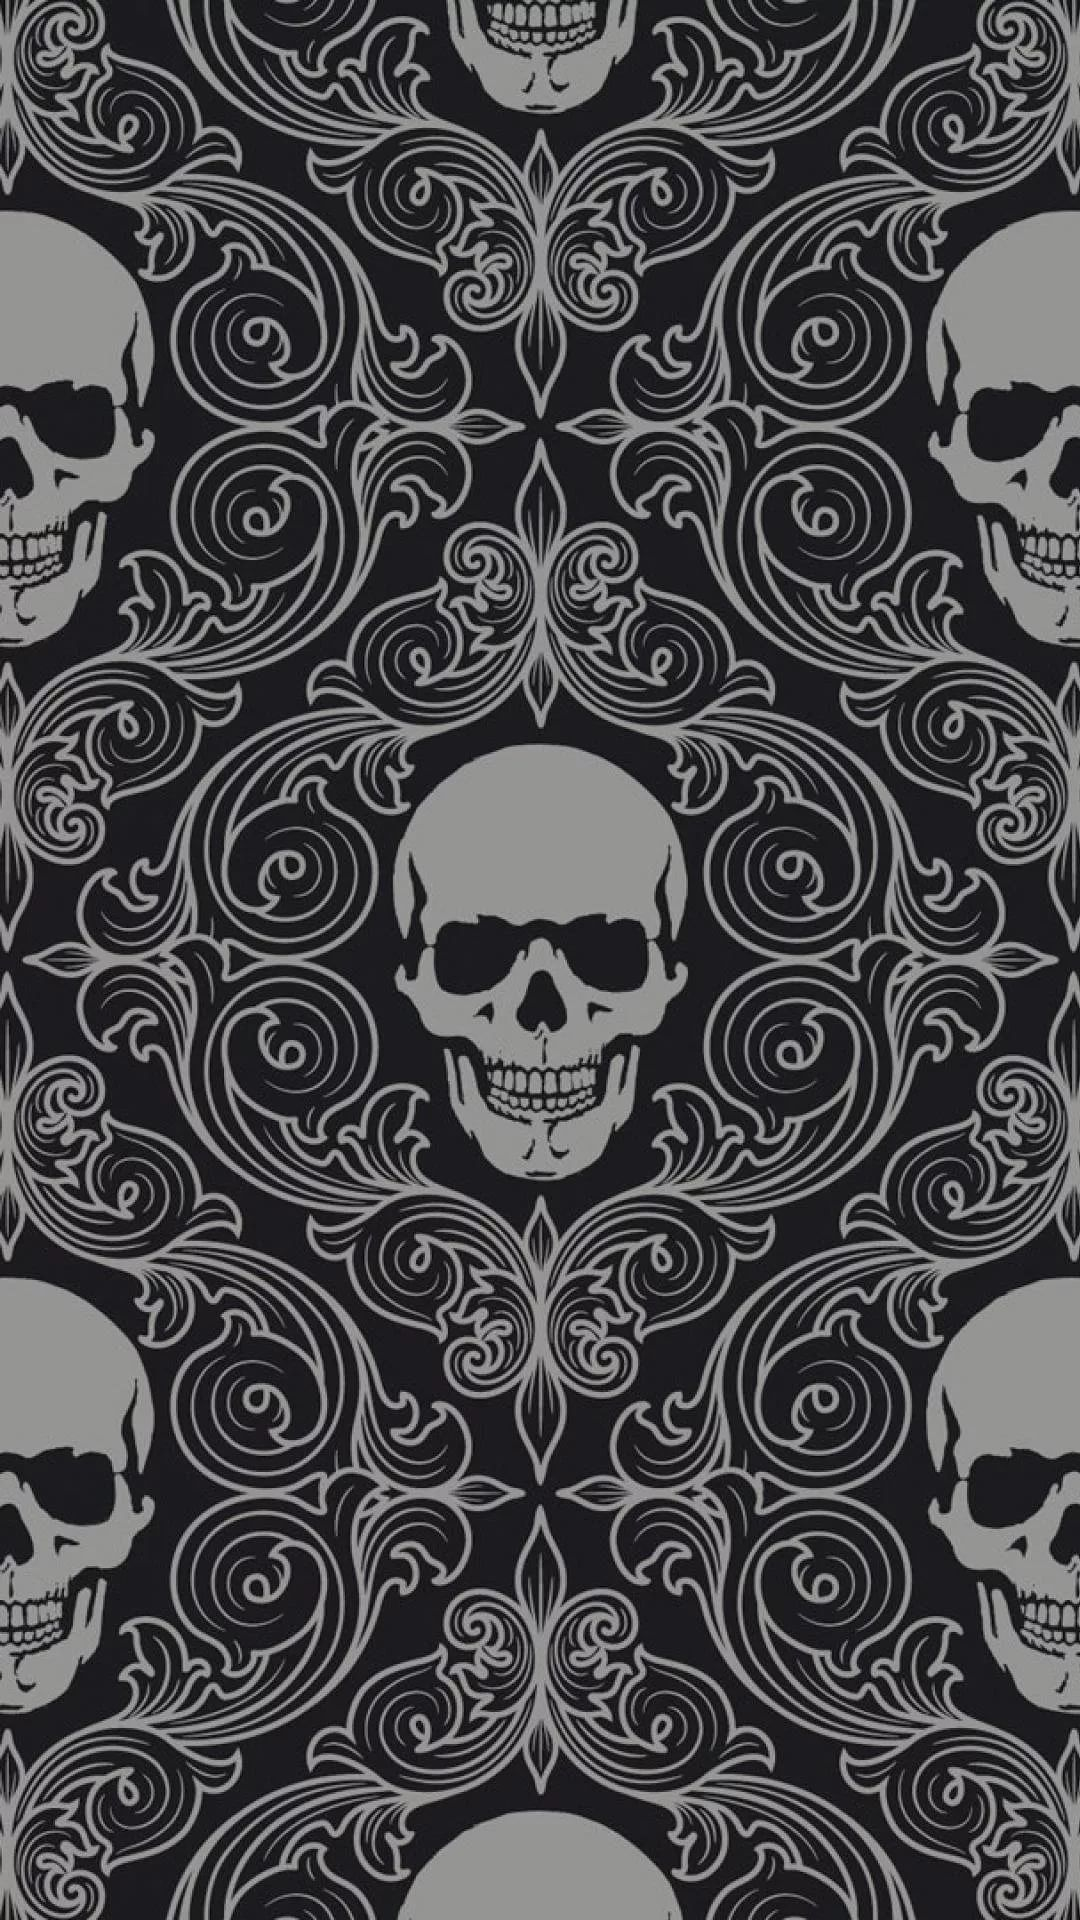 Skeleton iPhone 6s plus wallpaper